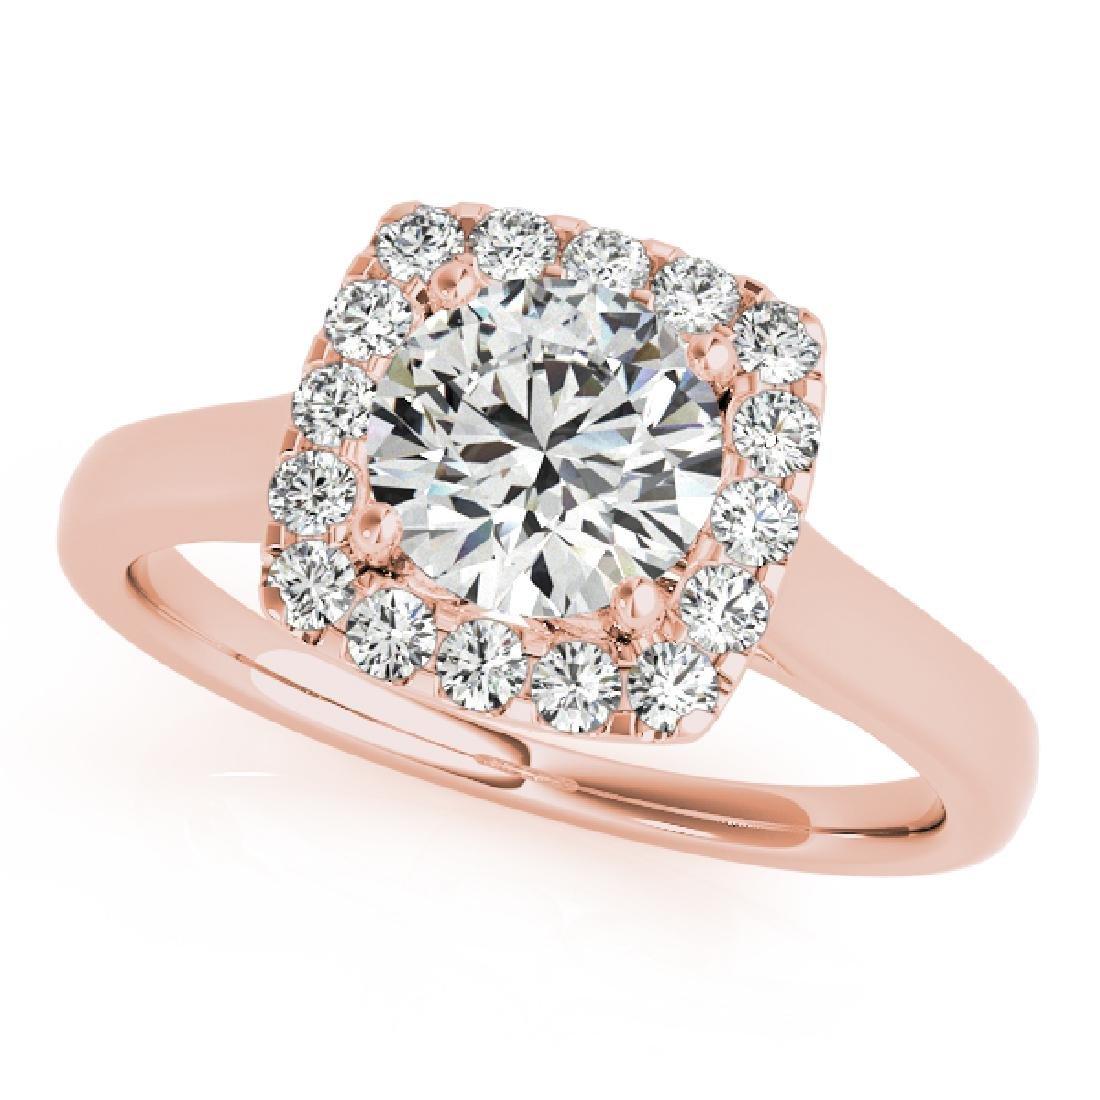 CERTIFIED 18K ROSE GOLD 1.57 CT G-H/VS-SI1 DIAMOND HALO